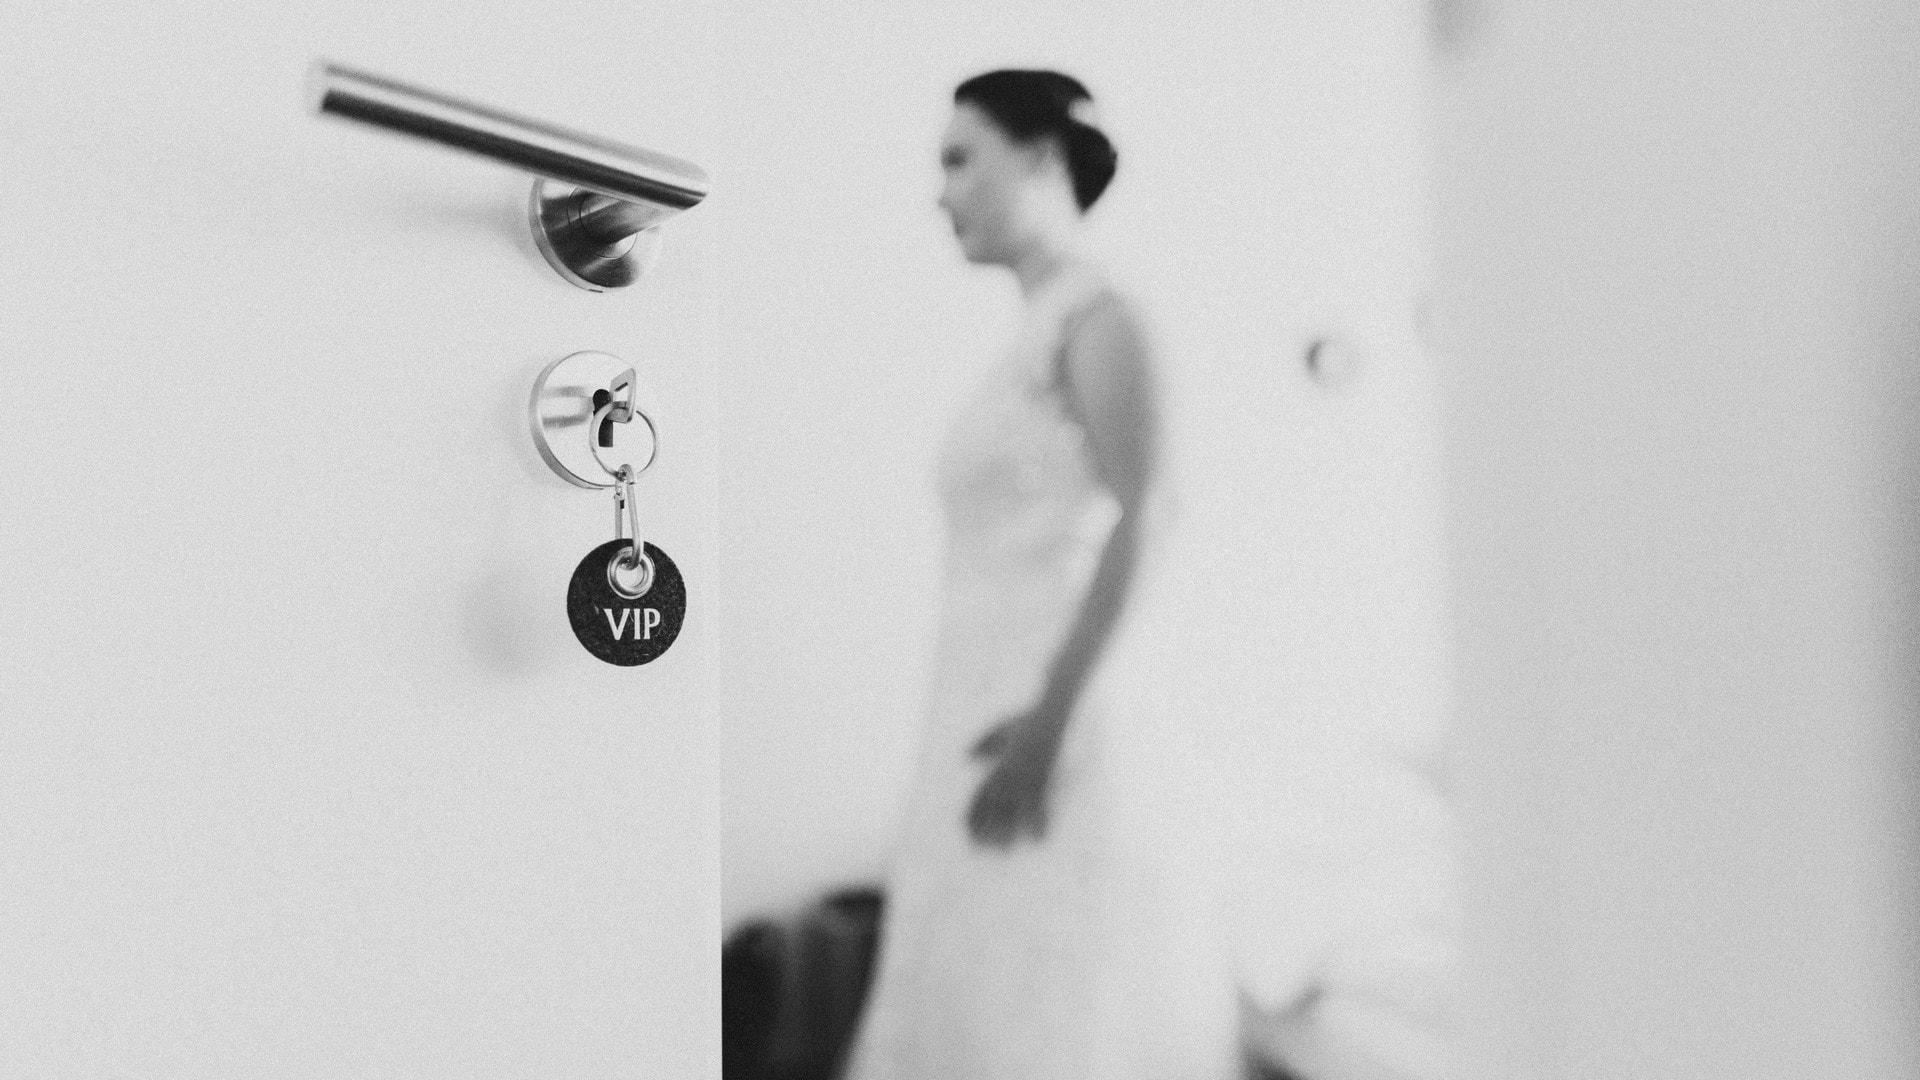 Hochzeitsreportage im oberhof birnau getting ready braut